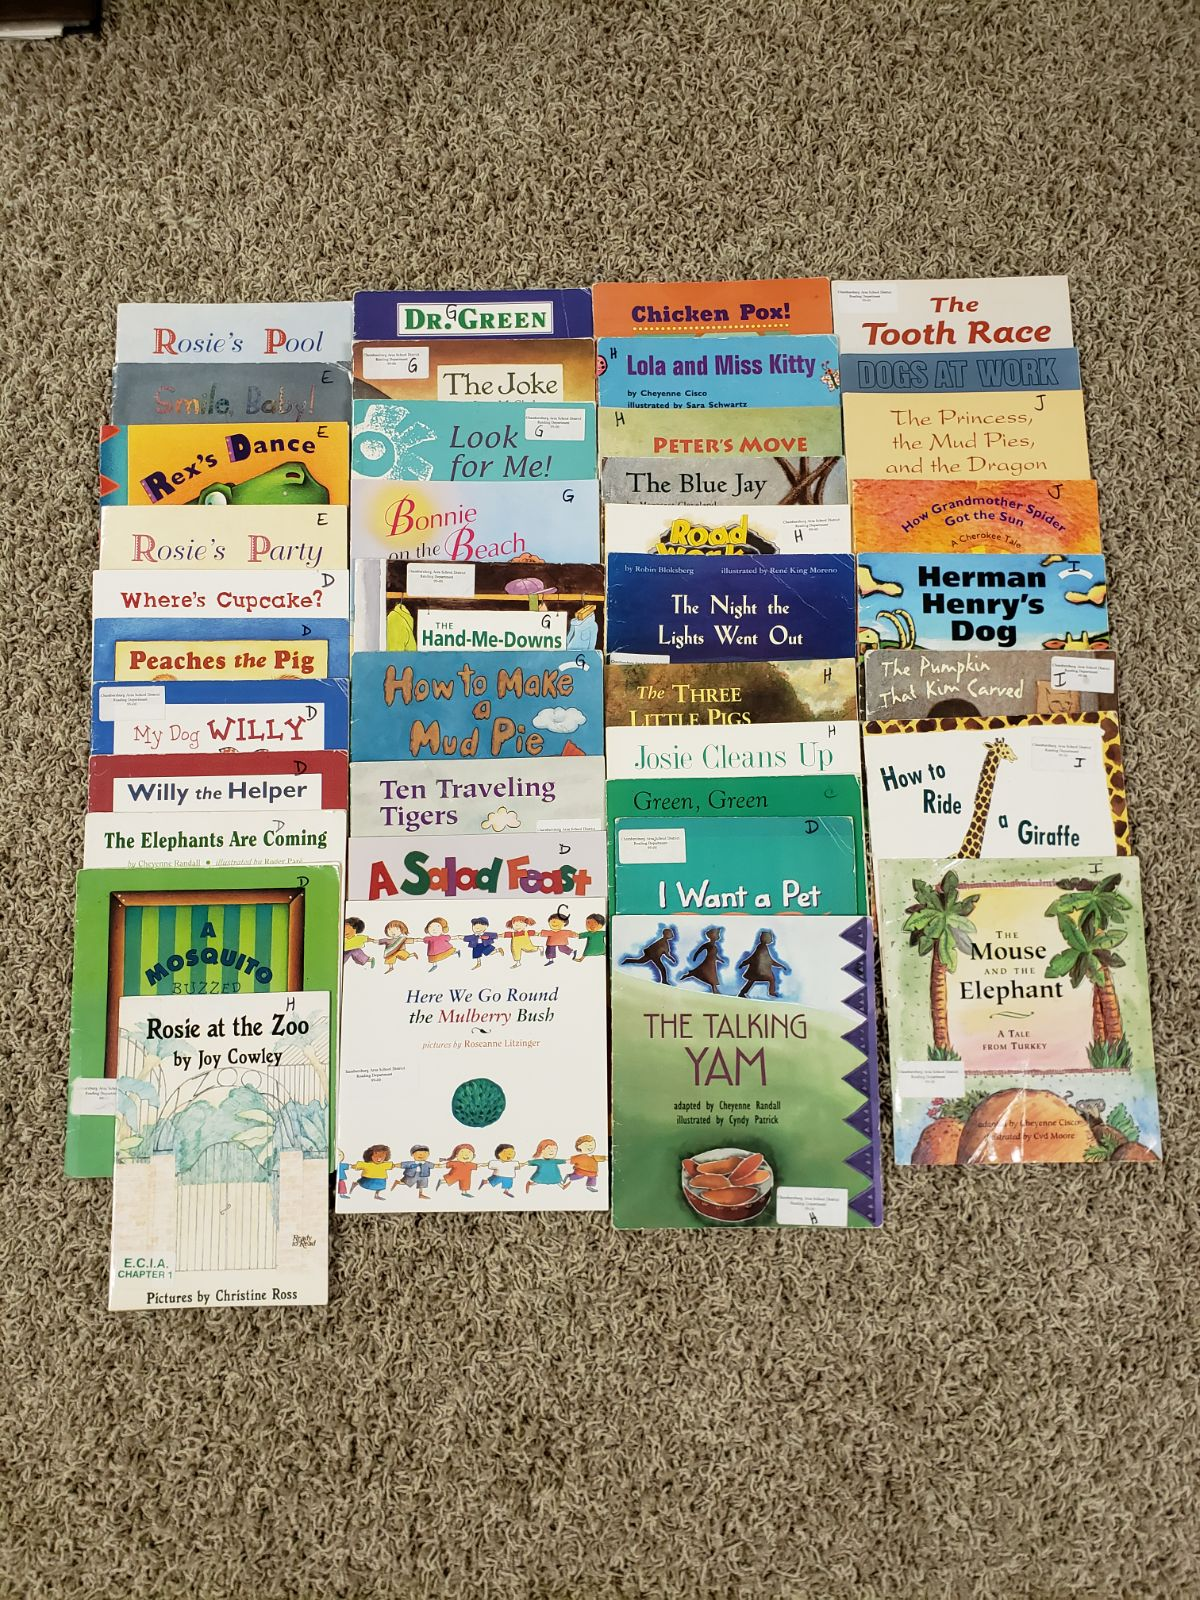 39 kids level reading books